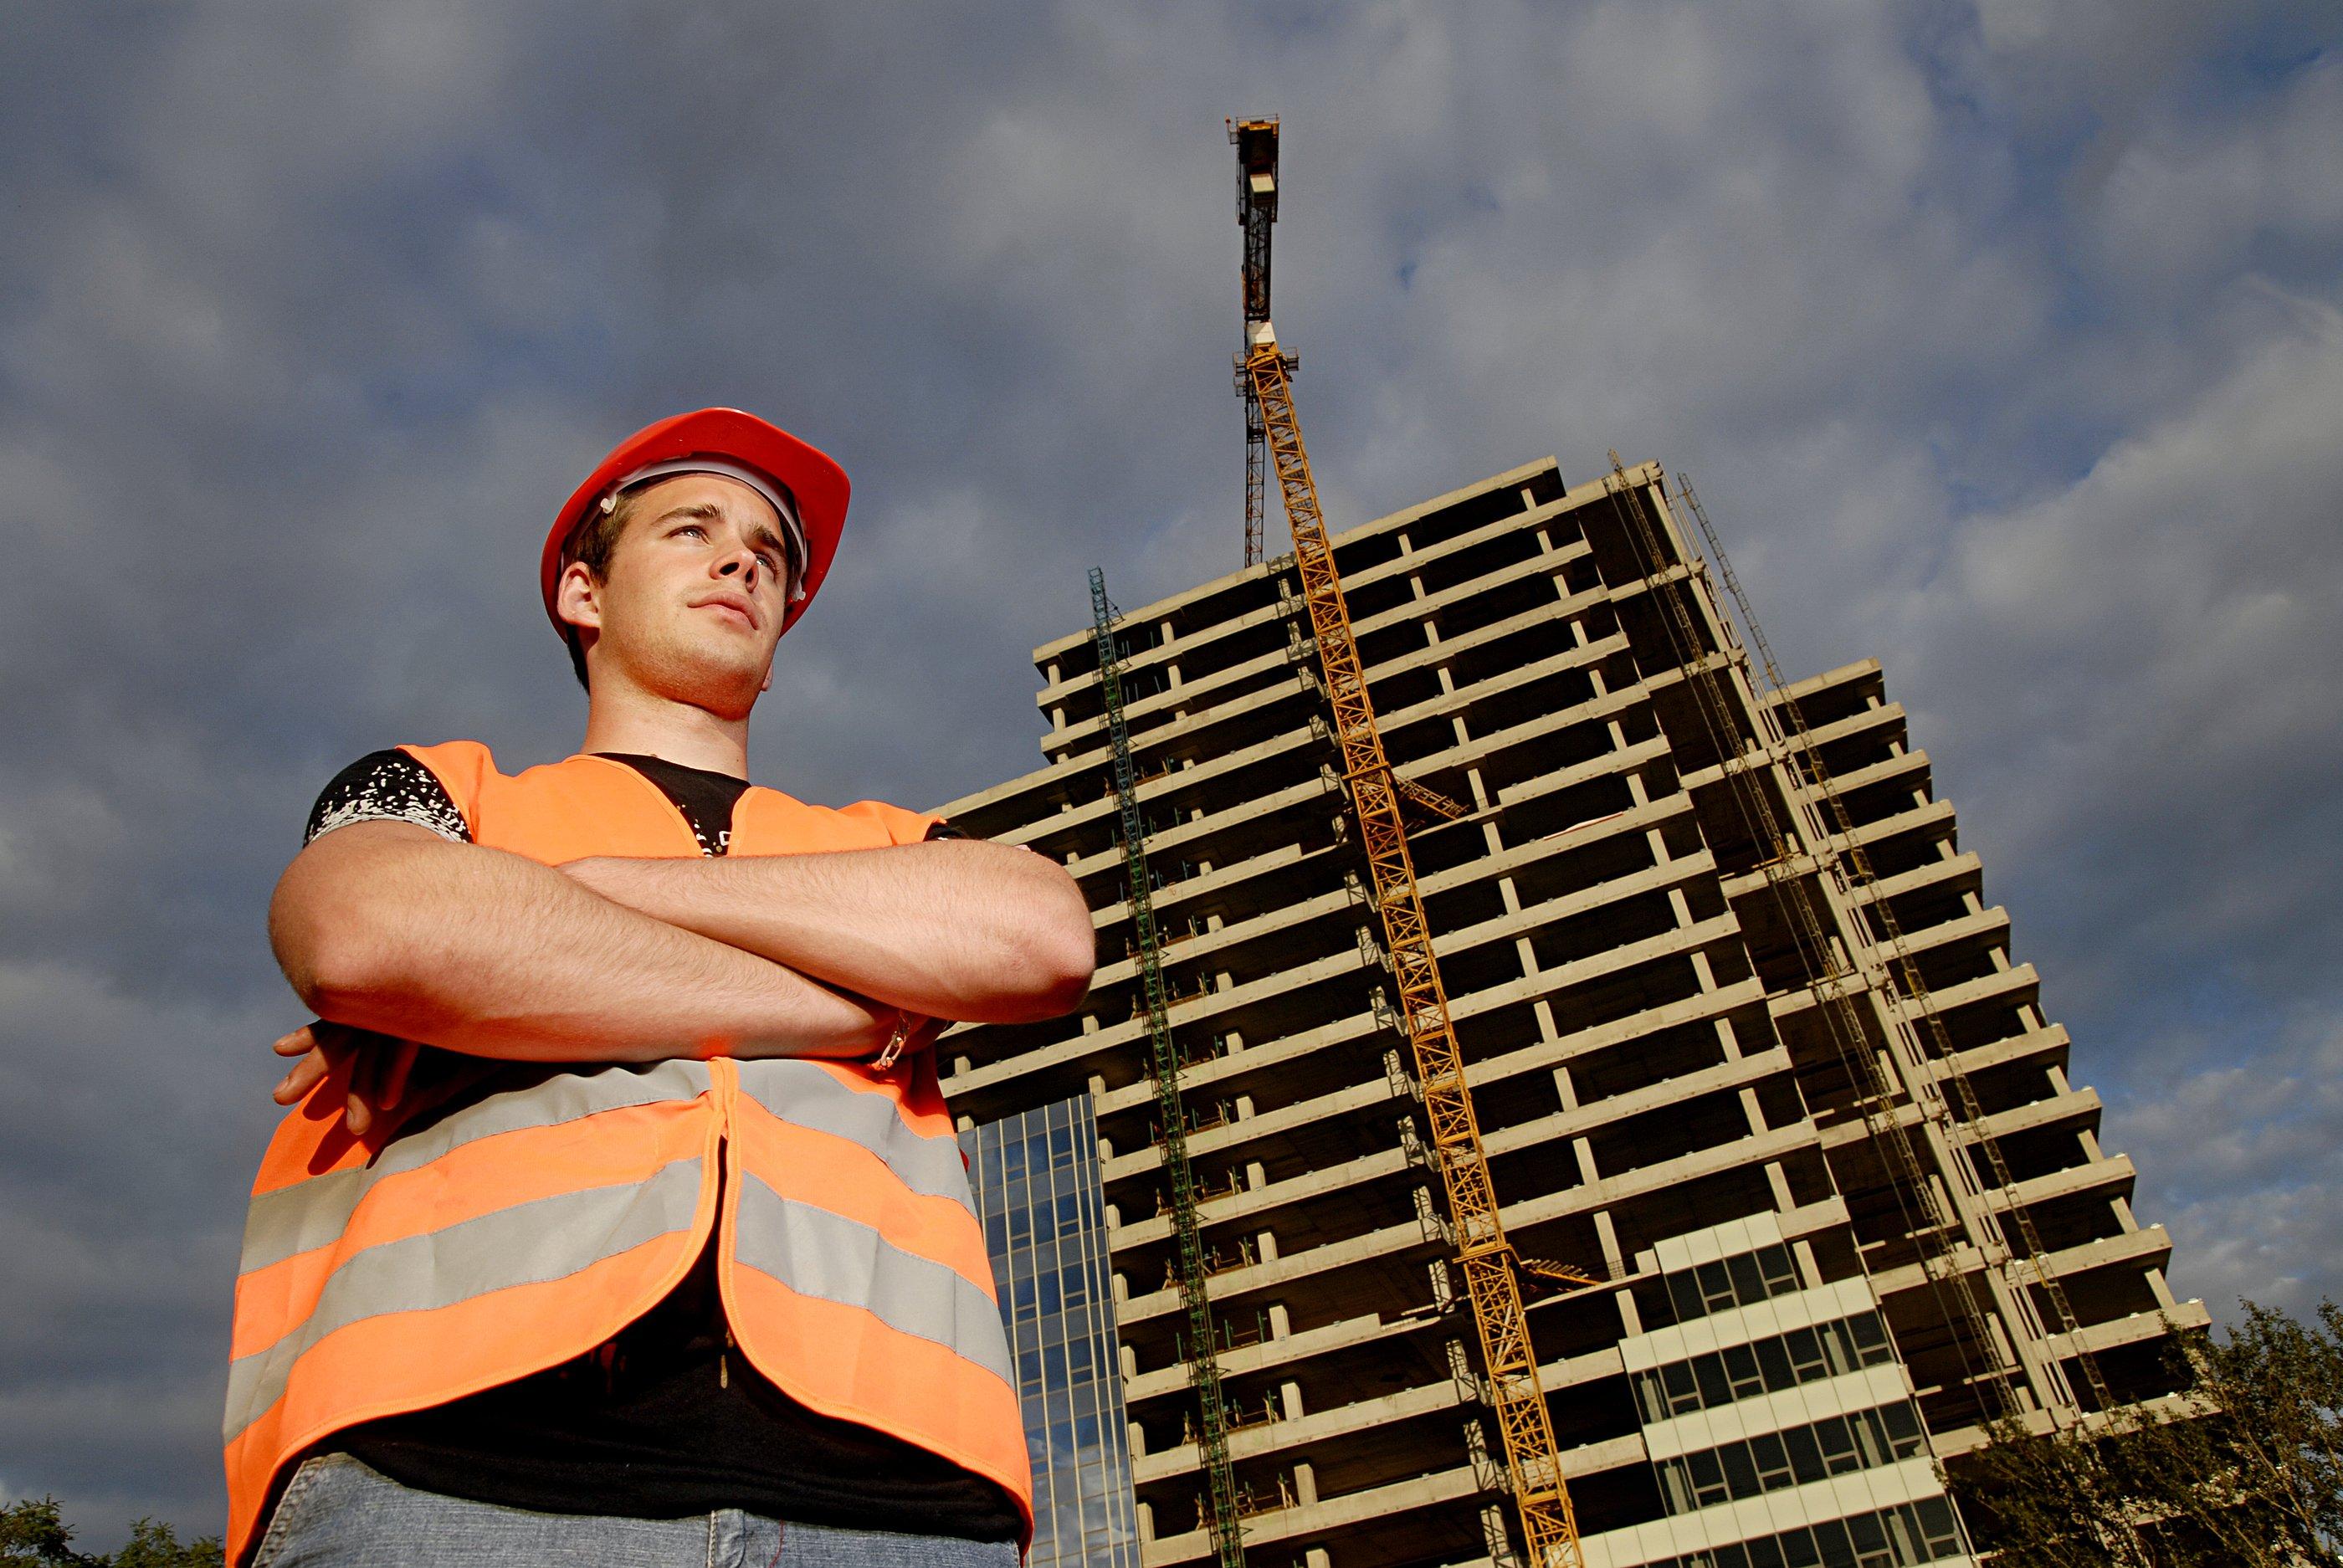 bigstock-Construction-Supervisor-1862412